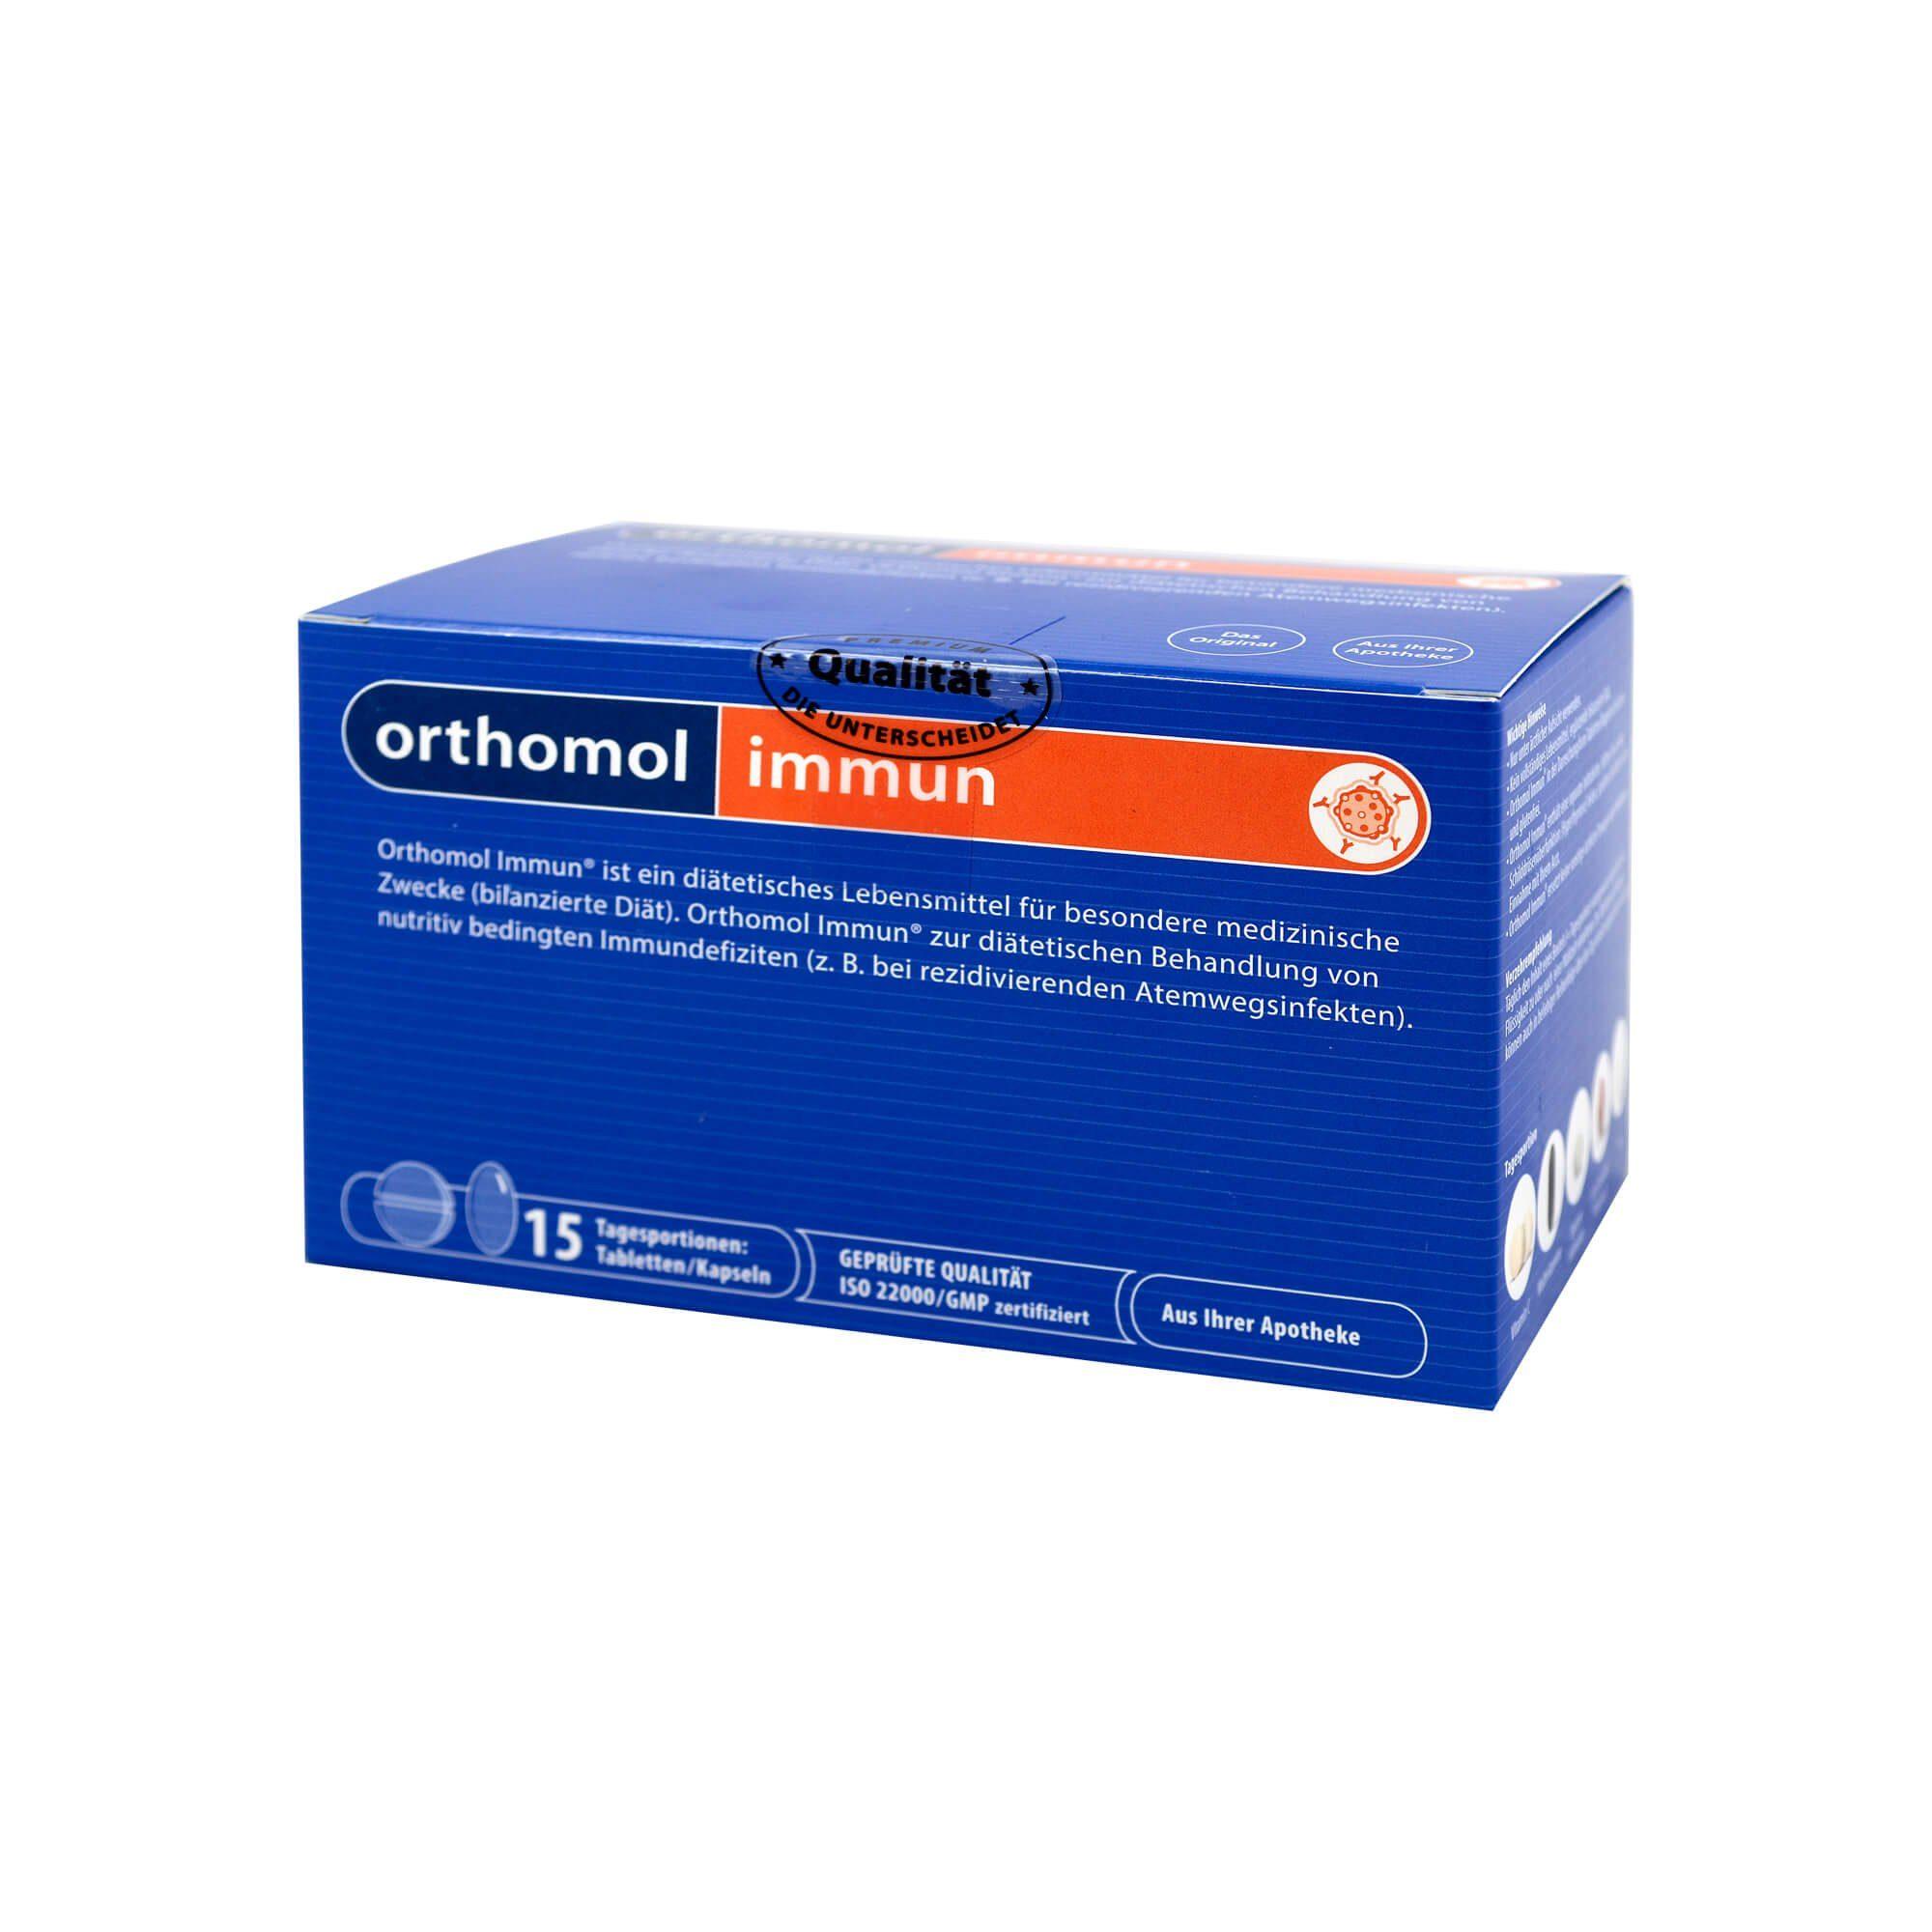 Orthomol Immun 15 Tabletten/Kapseln Kombipackung, 1 St